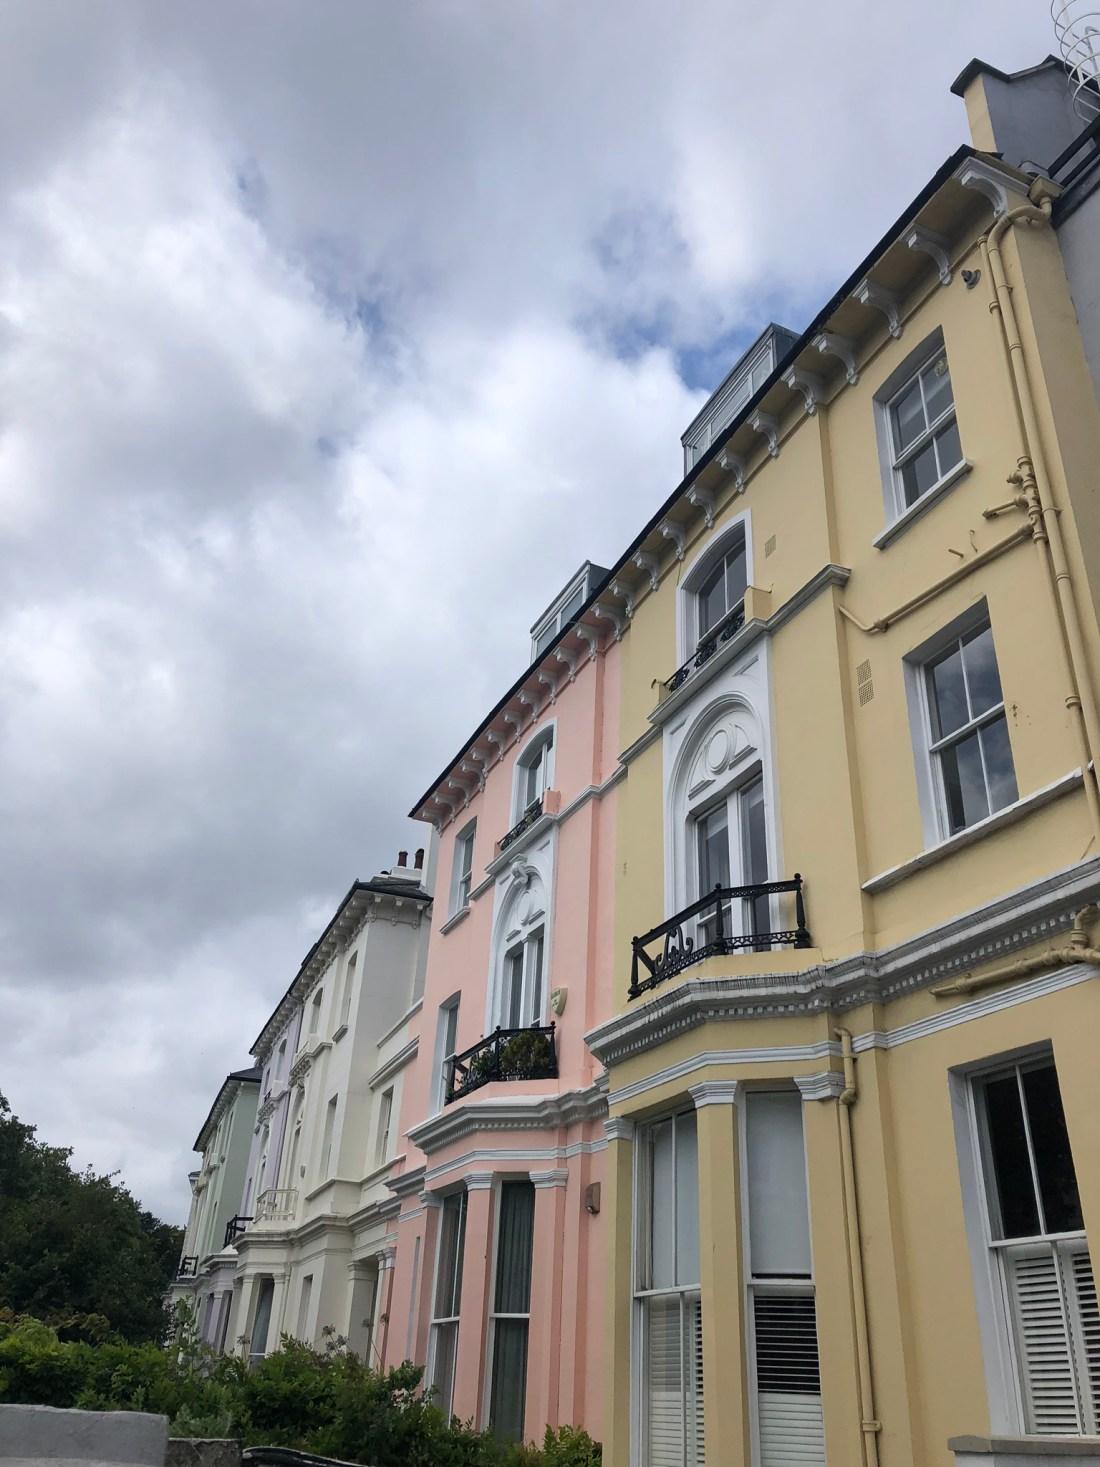 Houses of Primrose Hill, London